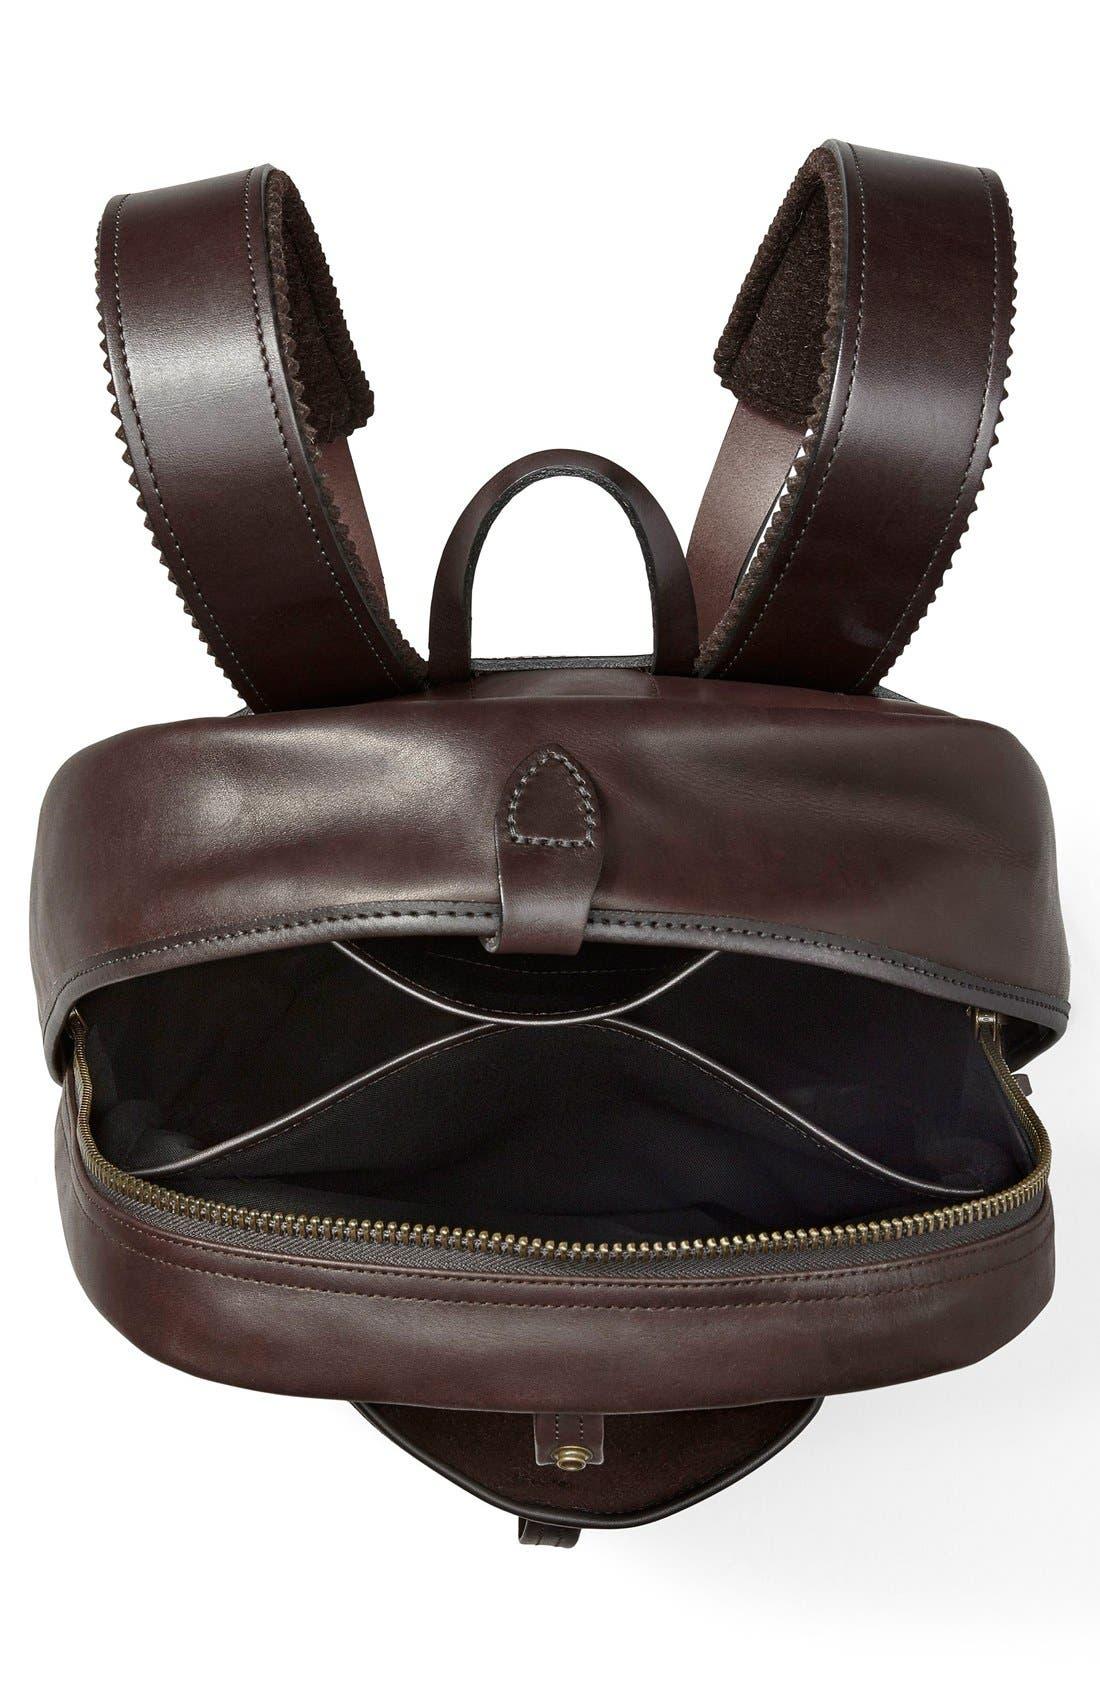 FILSON,                             Weatherproof Leather Backpack,                             Alternate thumbnail 3, color,                             206